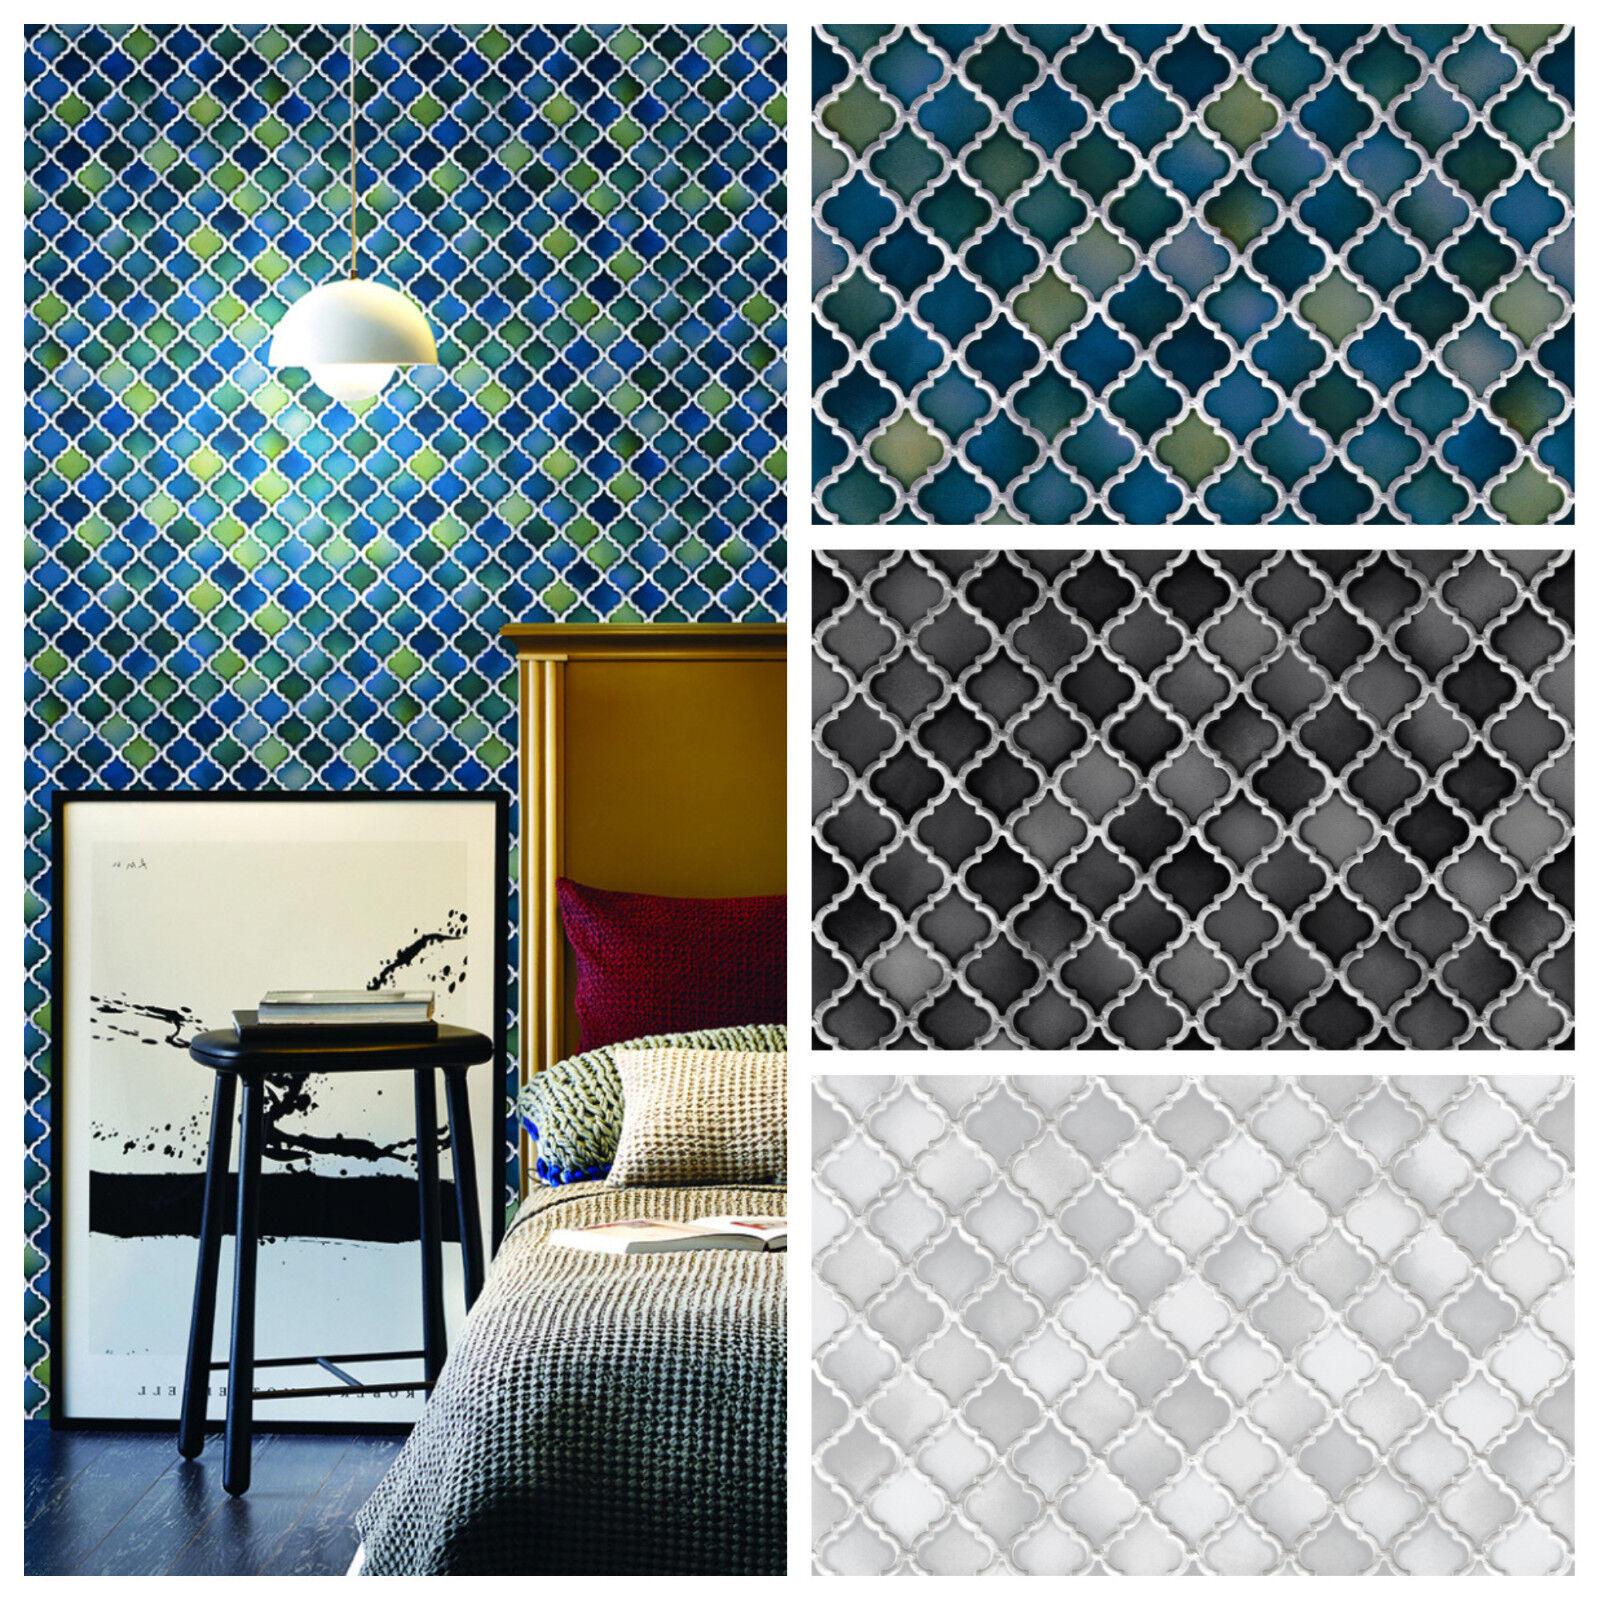 Vlies Tapete Stein Keramik Mosaik Fliesen Florentiner Optik Petrol Schwarz  Grau